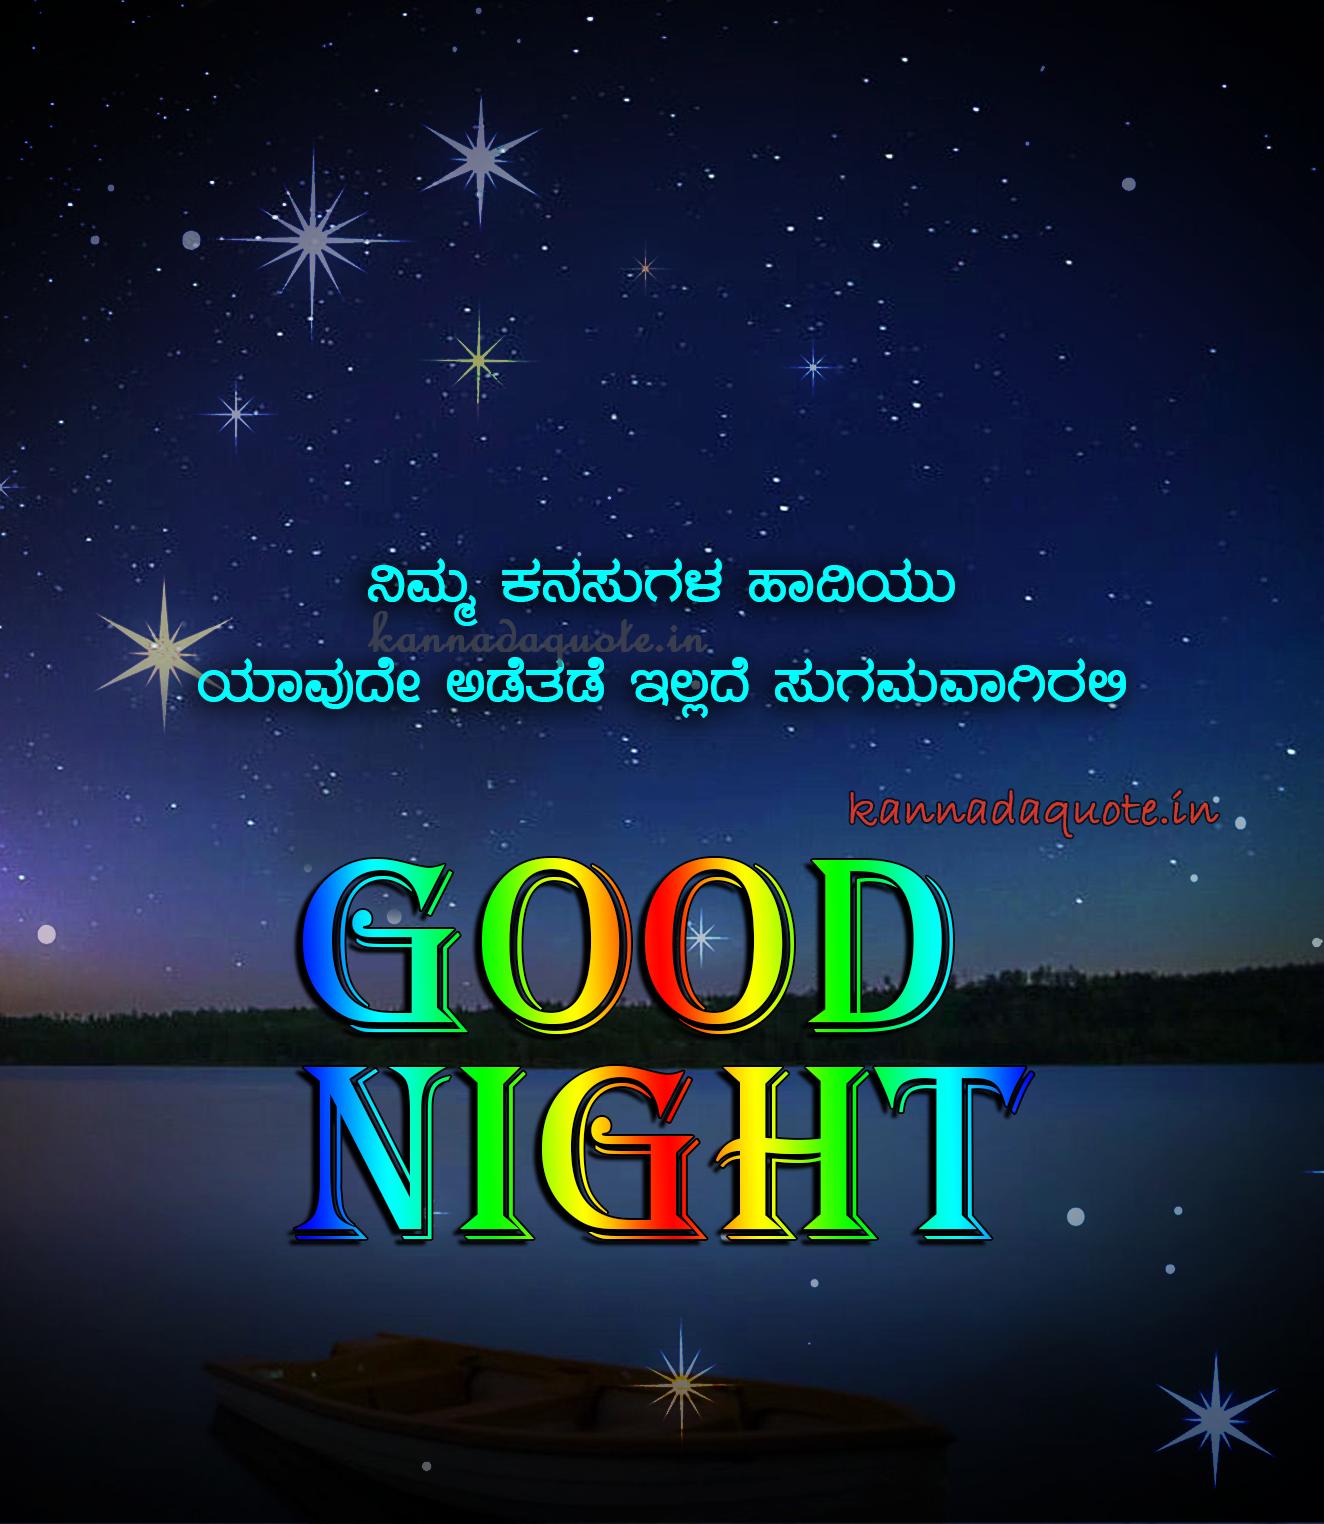 Good Night Sms In Kannada Good Night Quotes Night Quotes Good Night Love Quotes